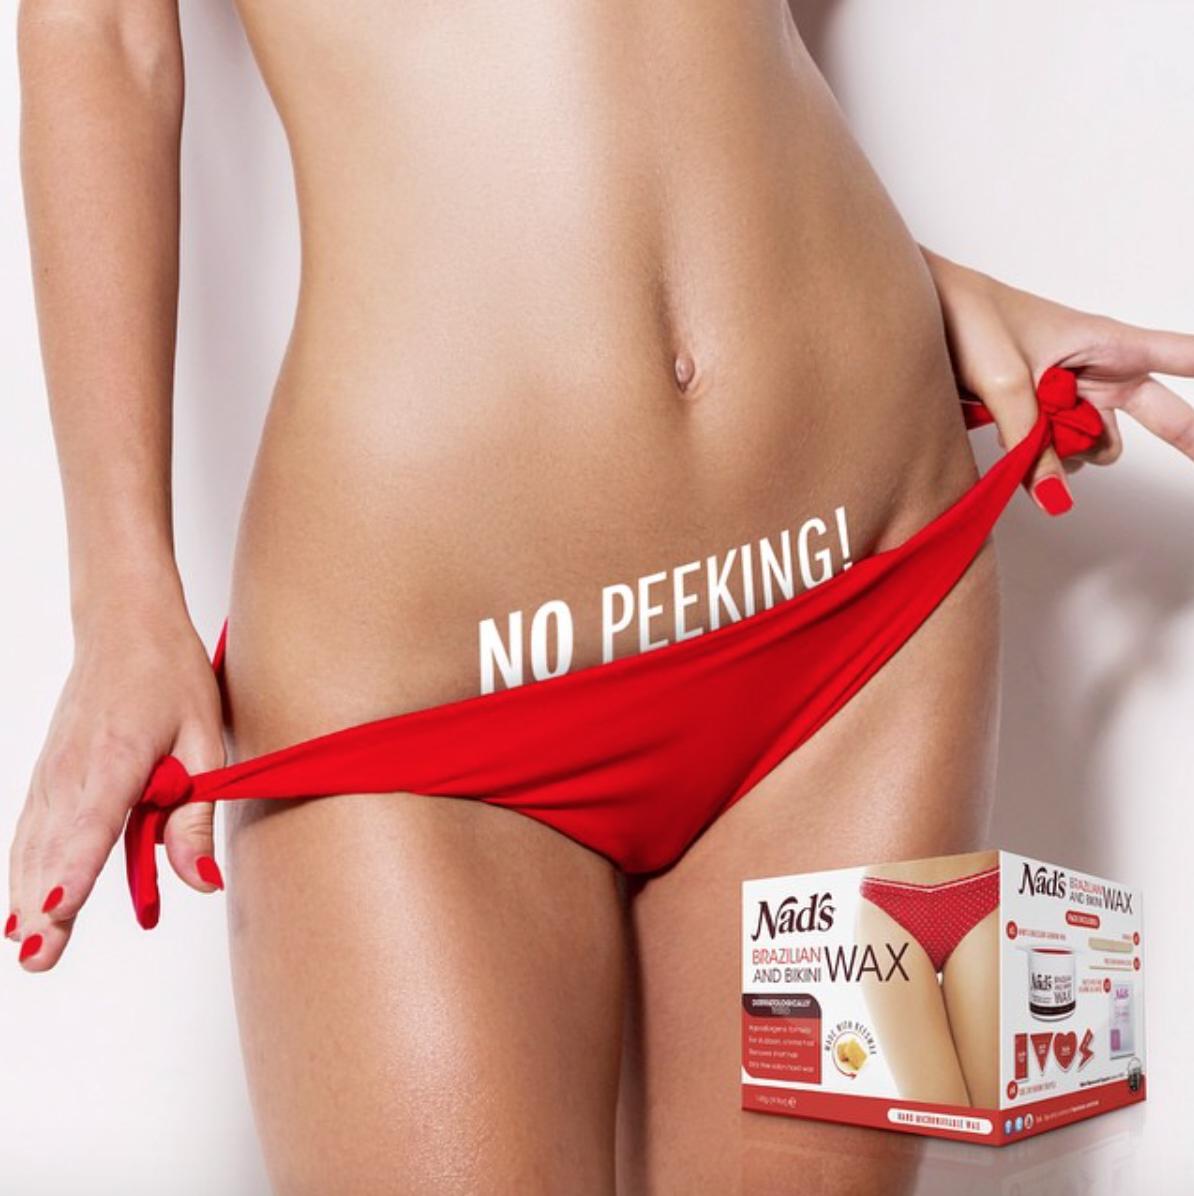 Are bikini nads wax assured, that